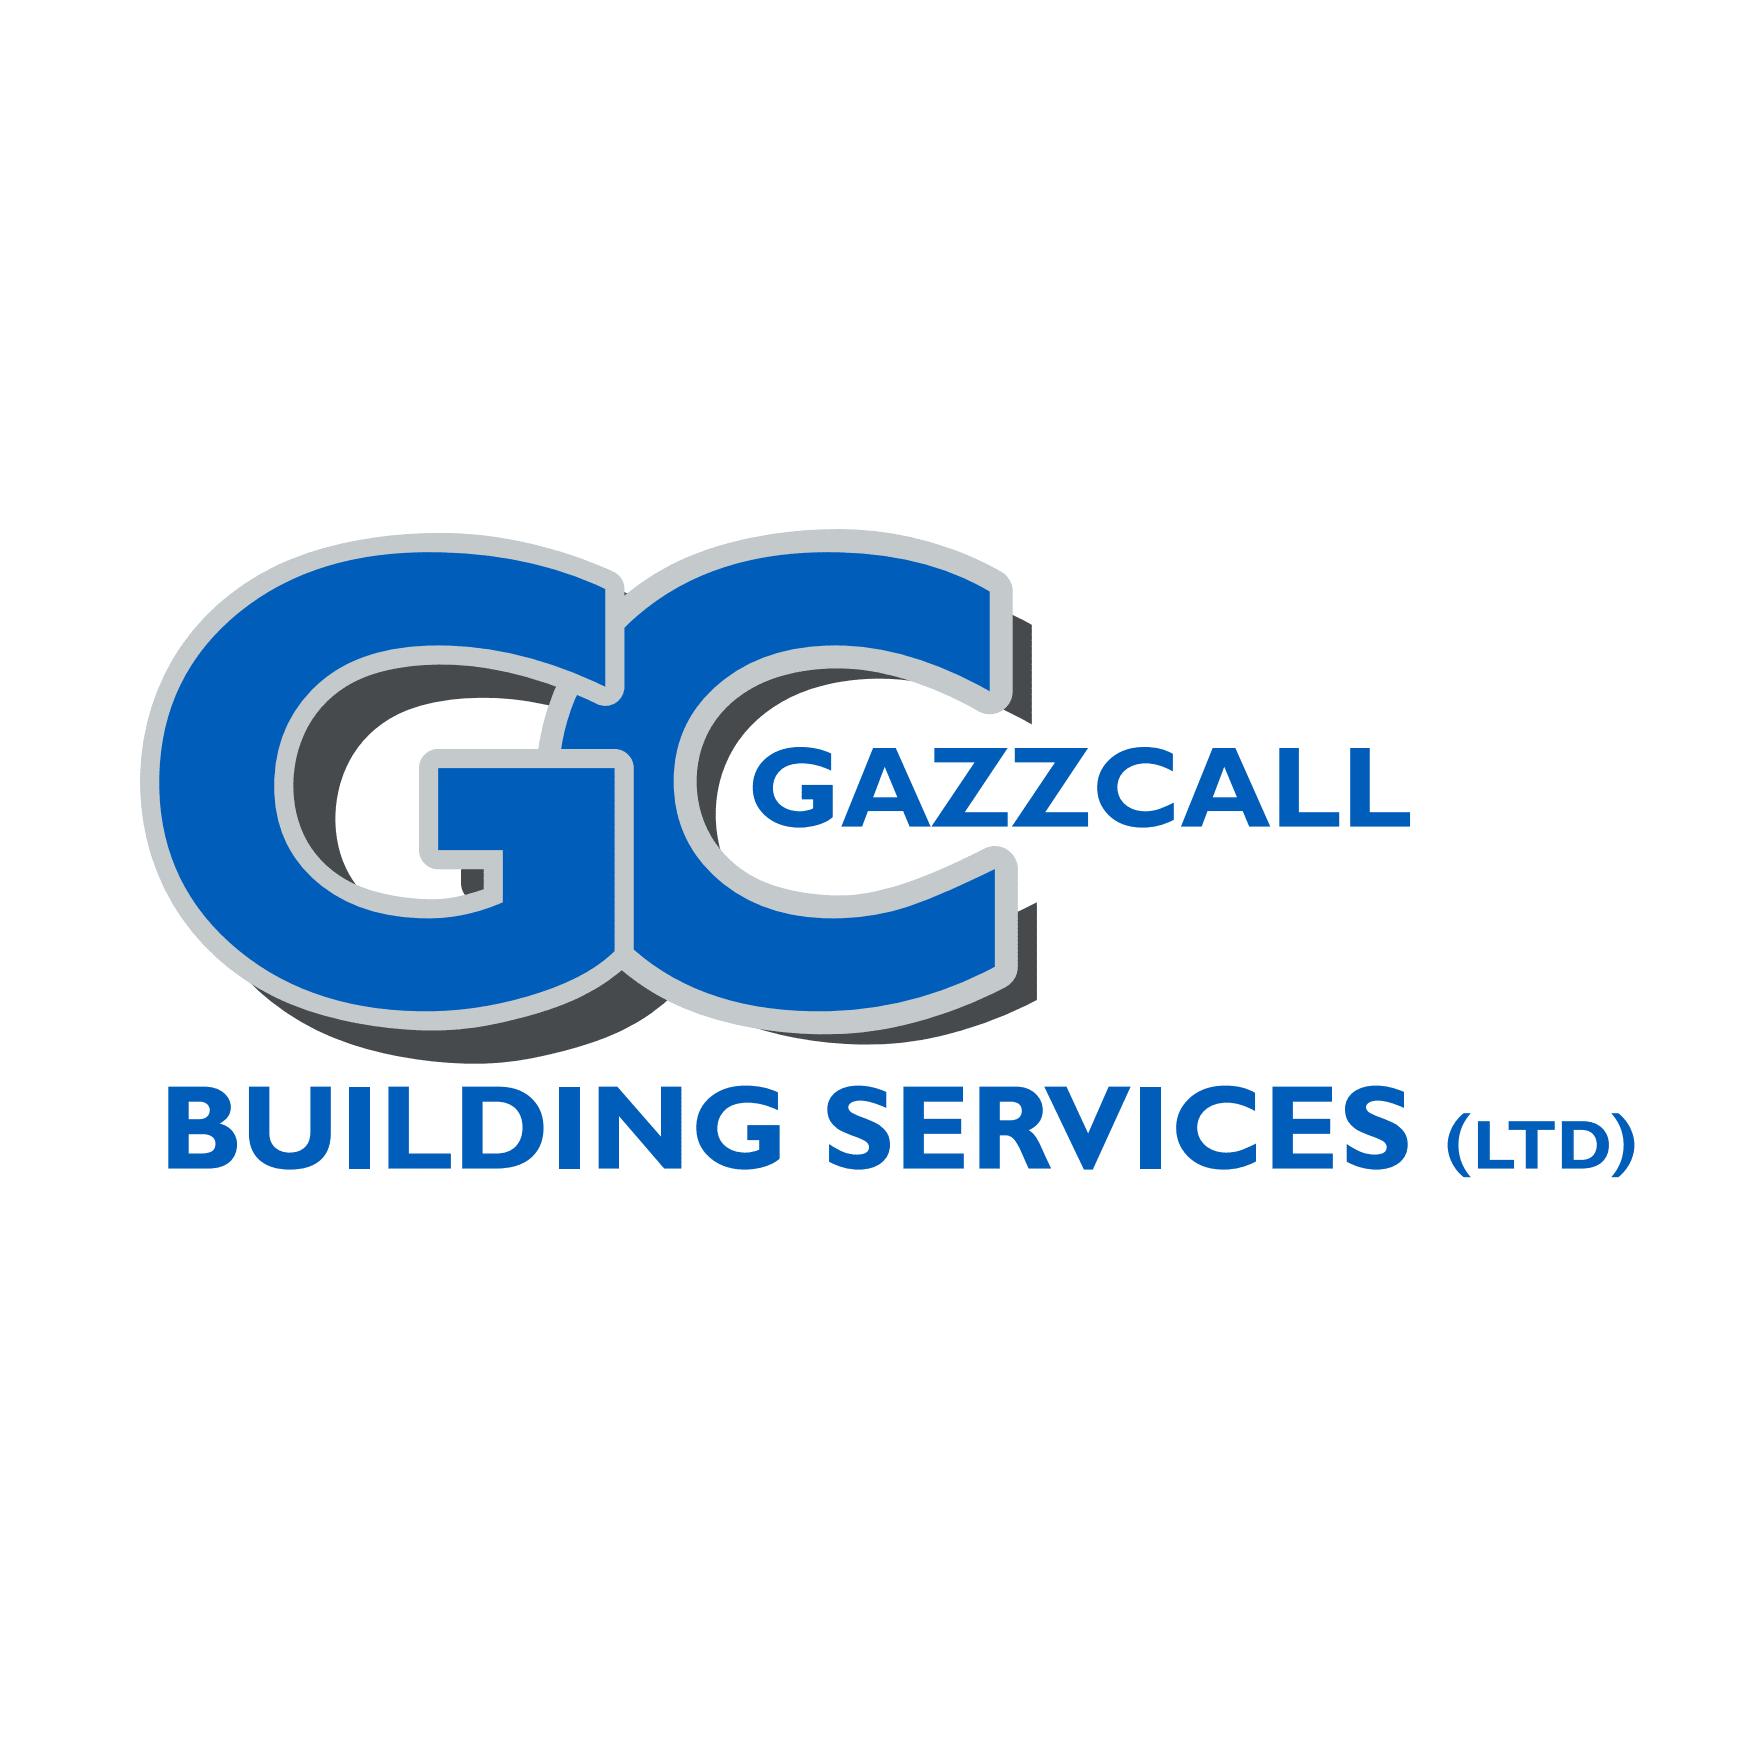 Gazzcall Building Services Ltd - Glasgow, Renfrewshire G44 3RT - 01415 761352   ShowMeLocal.com